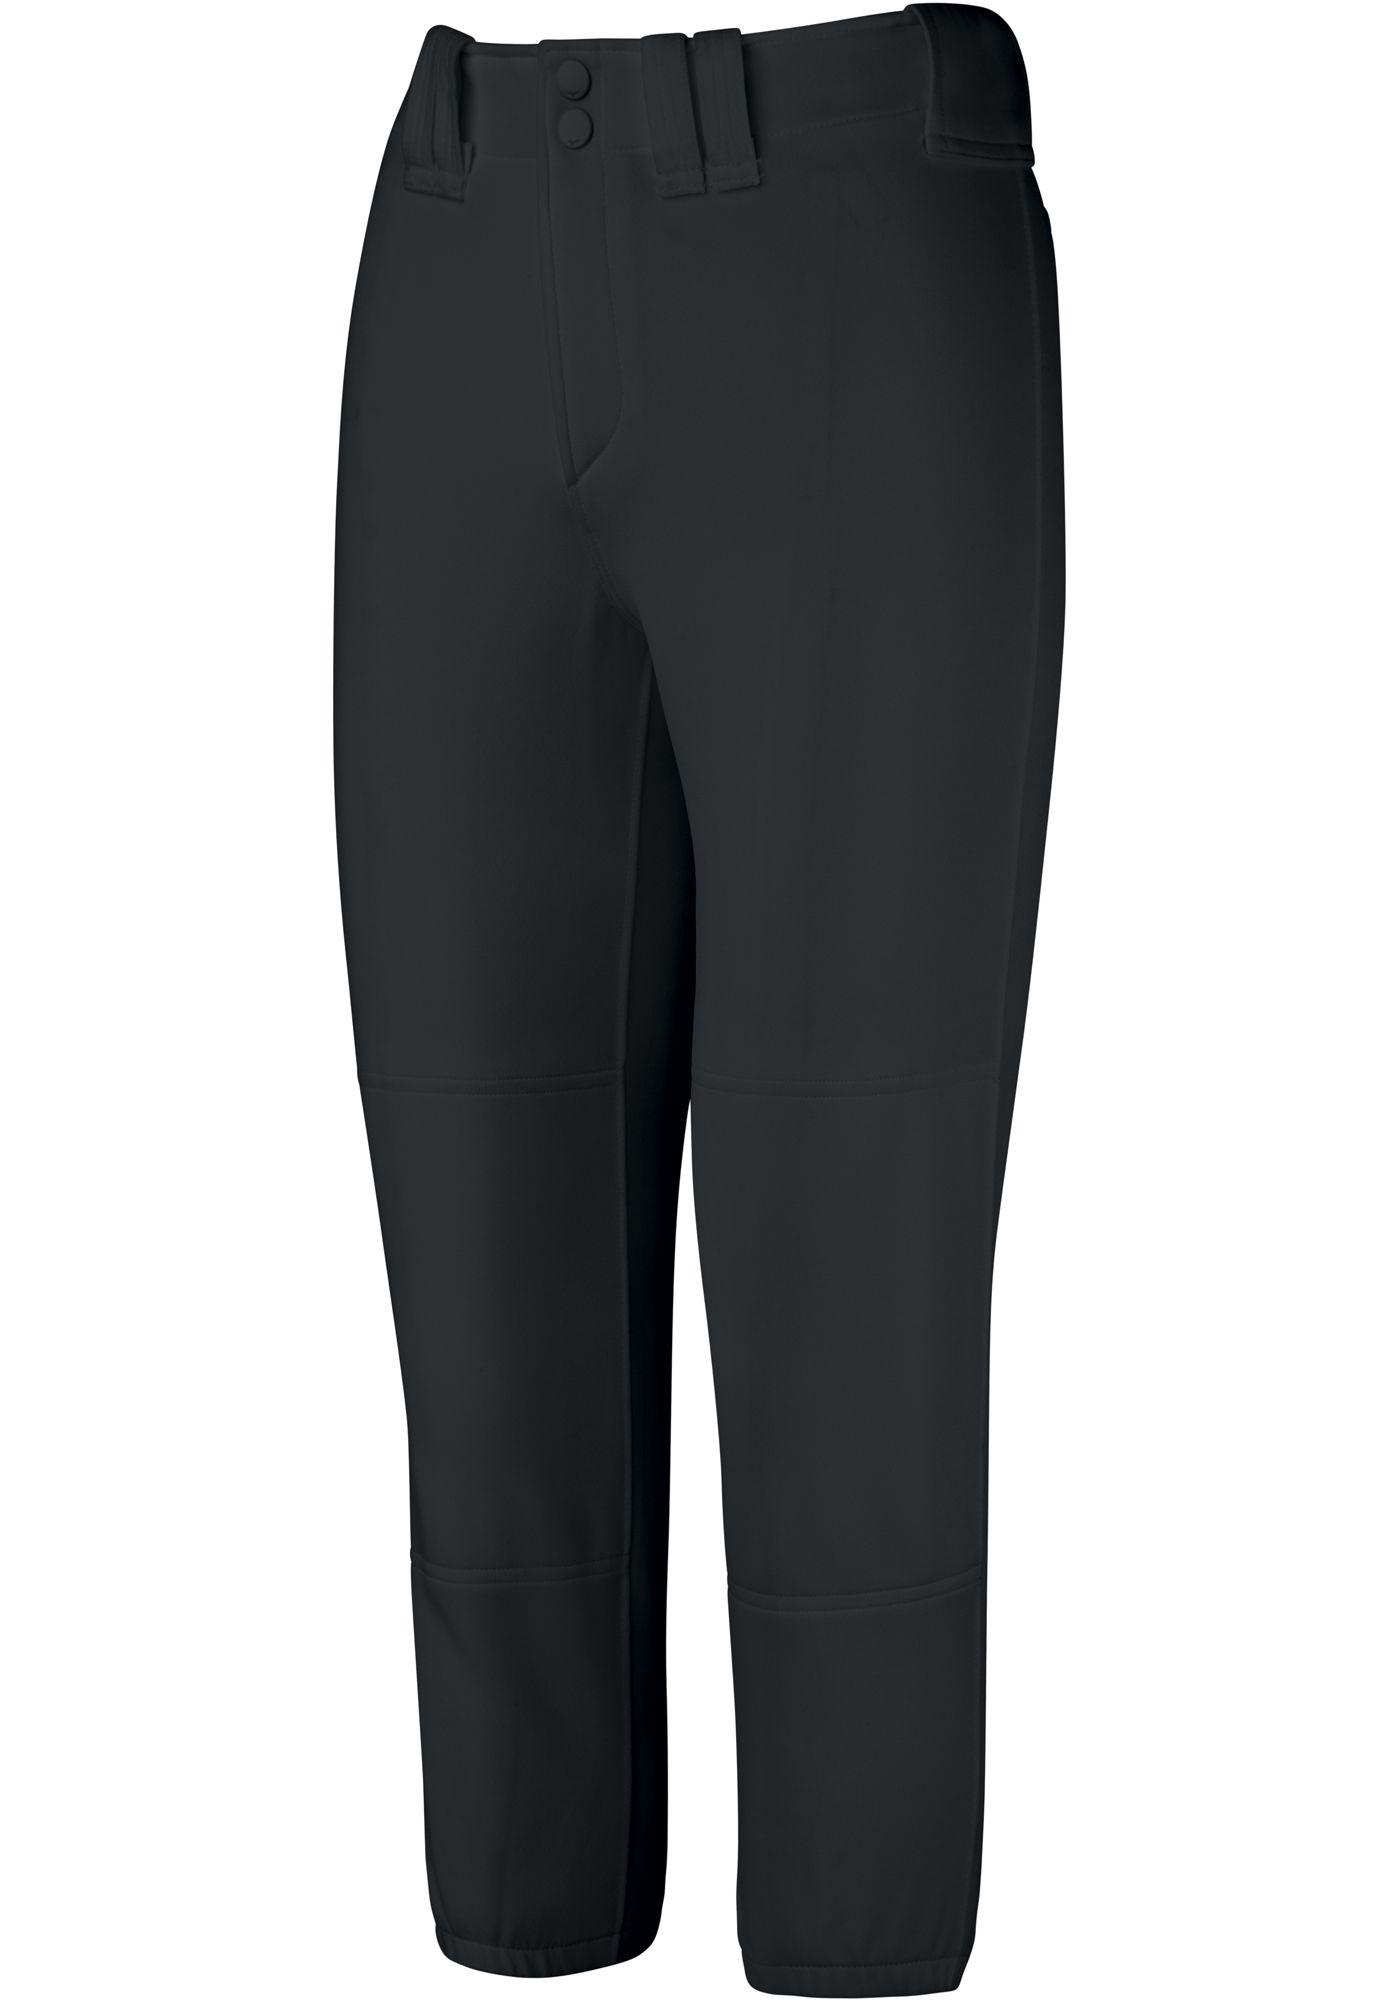 Mizuno Girls' Belted Softball Pants